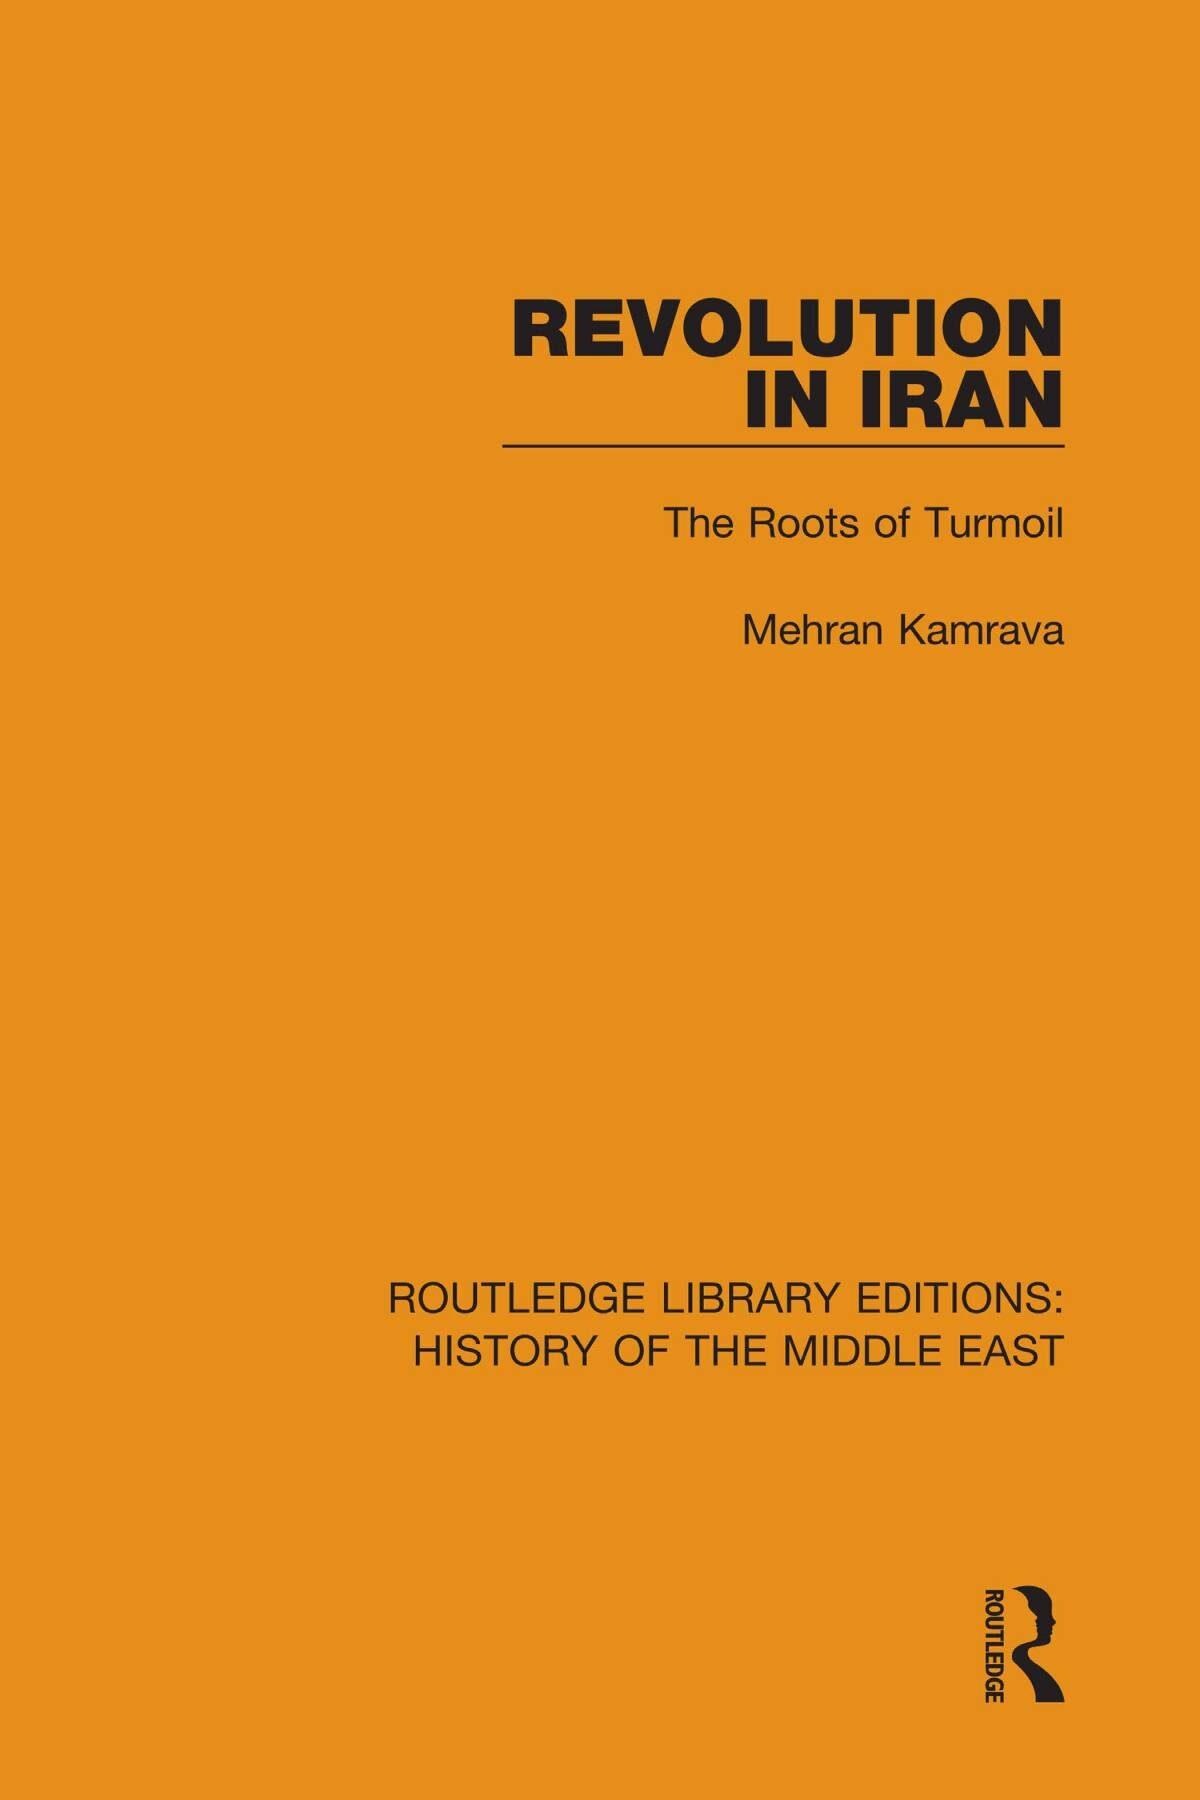 Revolution in Iran: The Roots of Turmoil